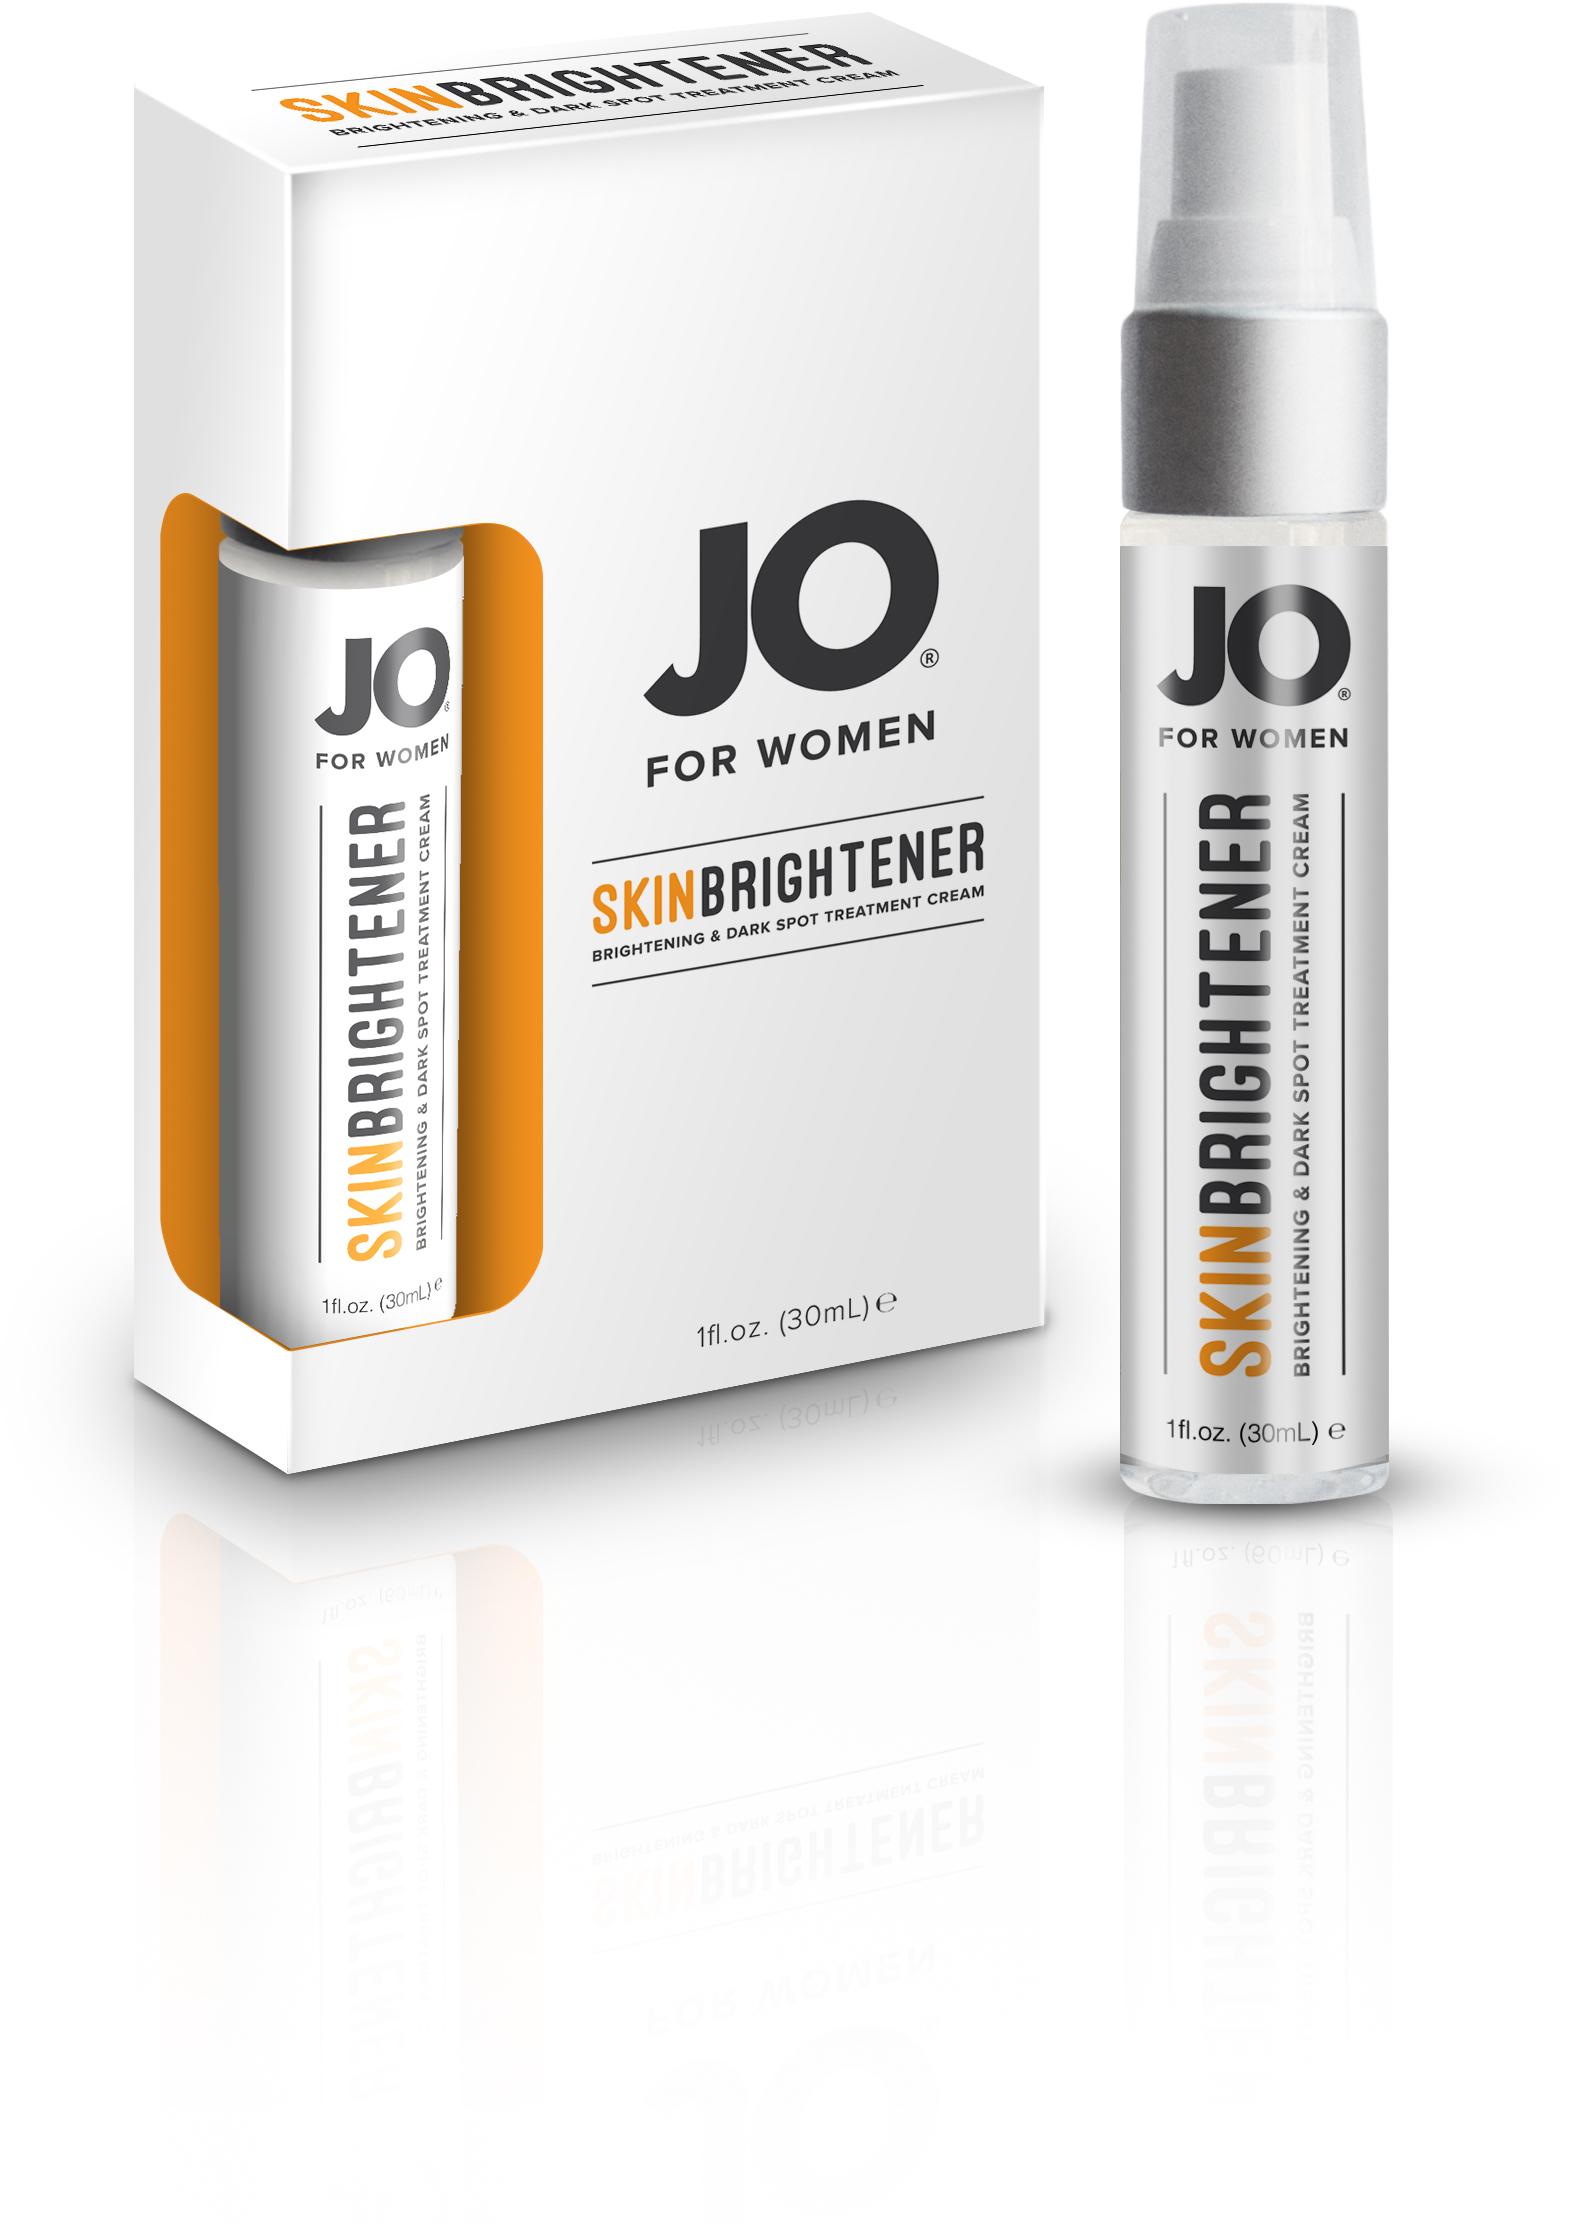 40448_JO_skin_brightener_1_oz_unicarton.jpg